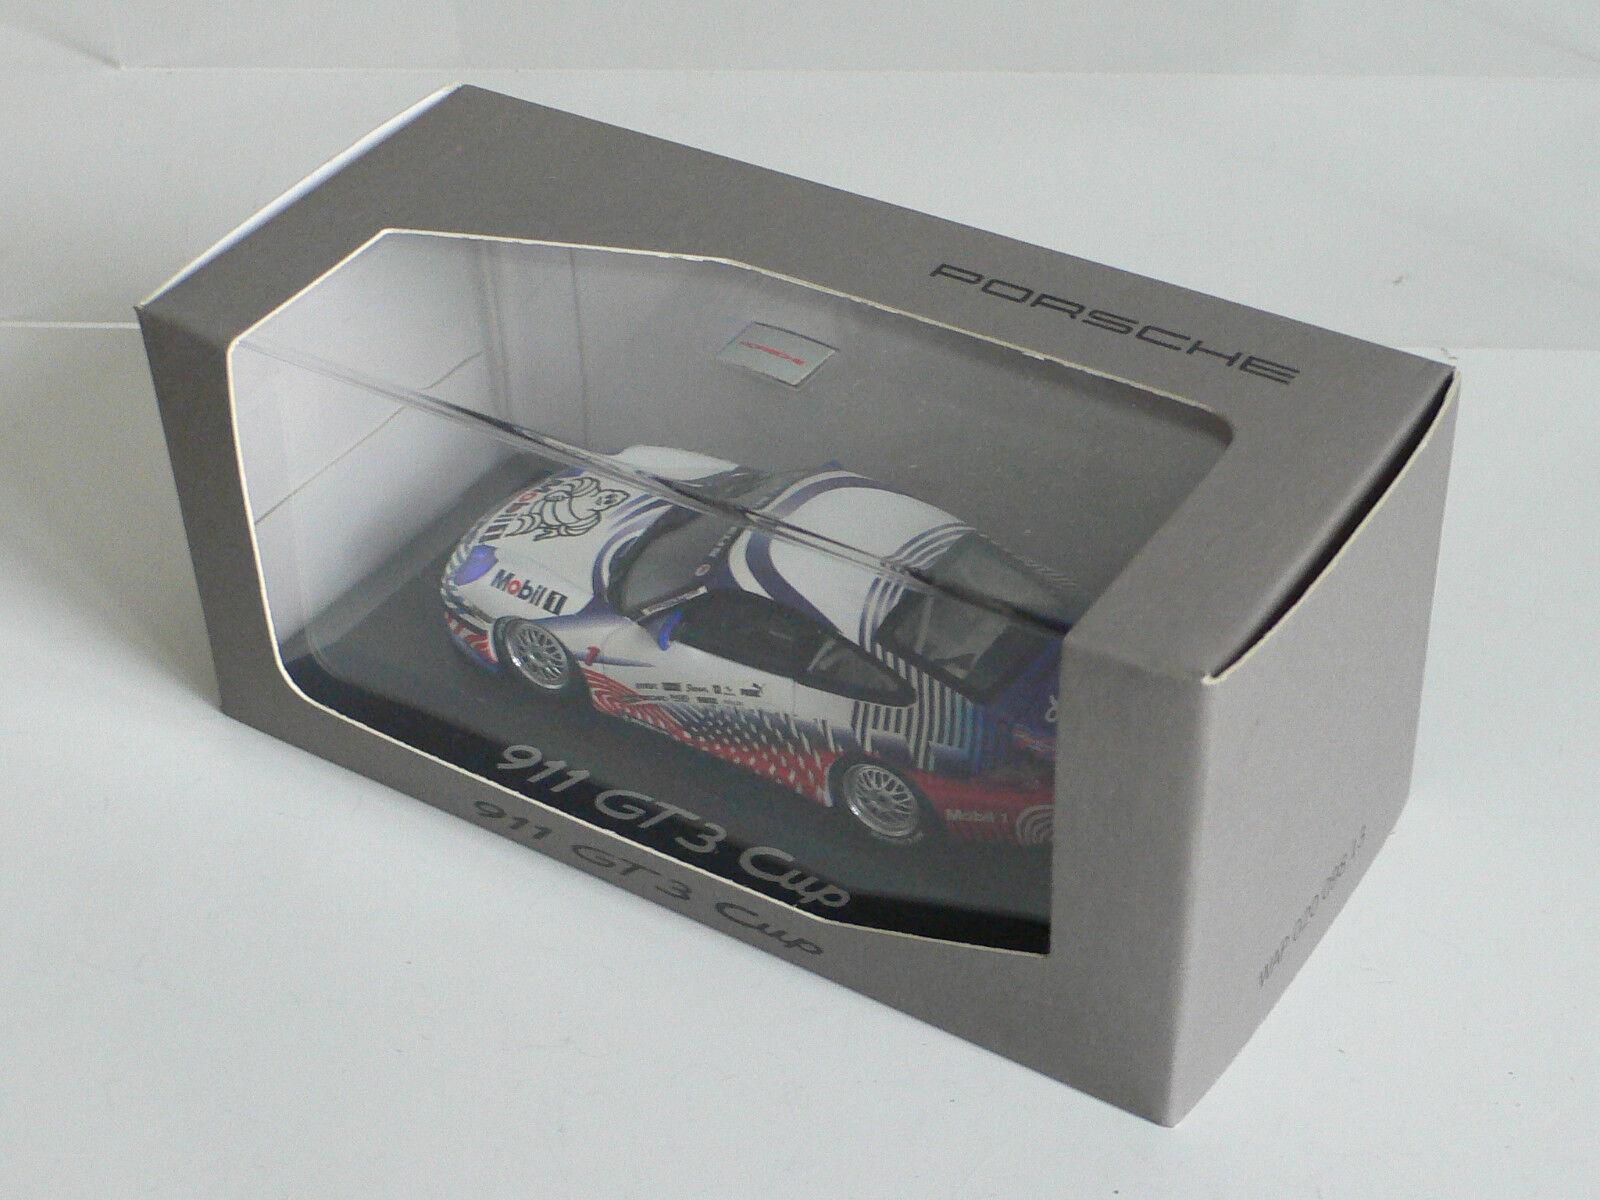 Minichamps 1 43 Porsche 996 911 911 911 GT3 Cup Race Car Michelin Dealer Model Rare acf72e